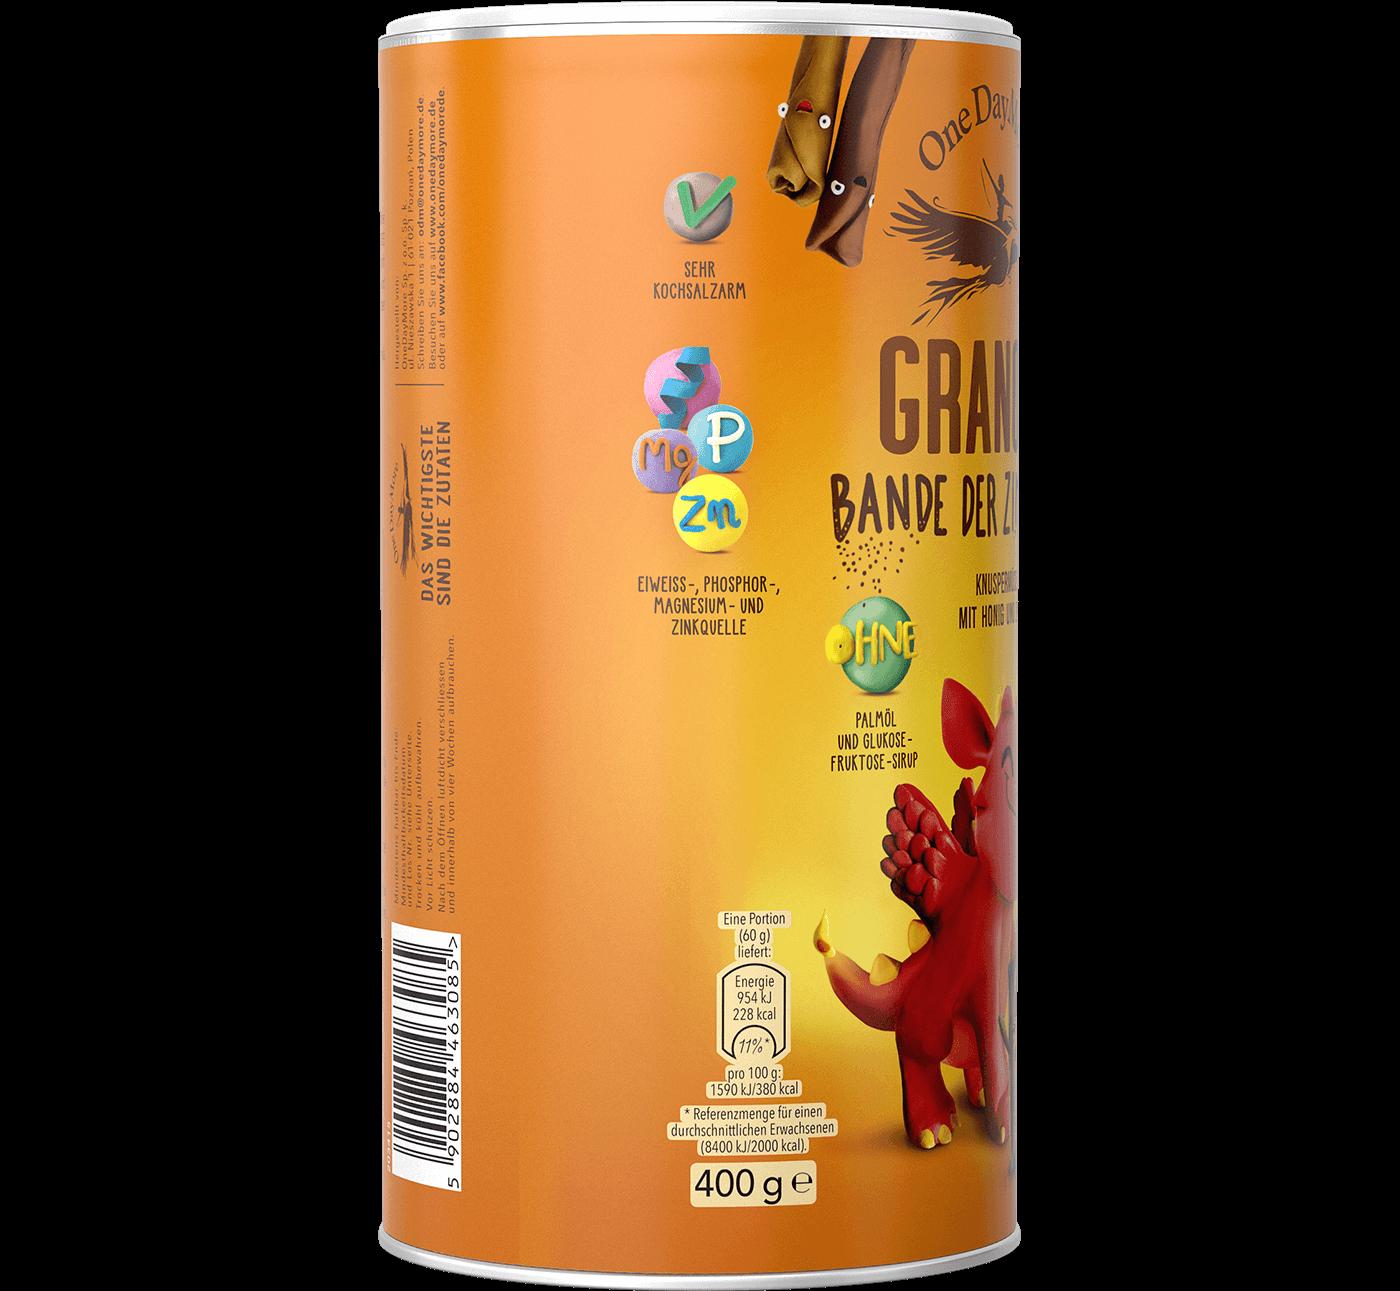 granola-bande-der-zimtchen-onedaymore-bok-tuba-1400×1291